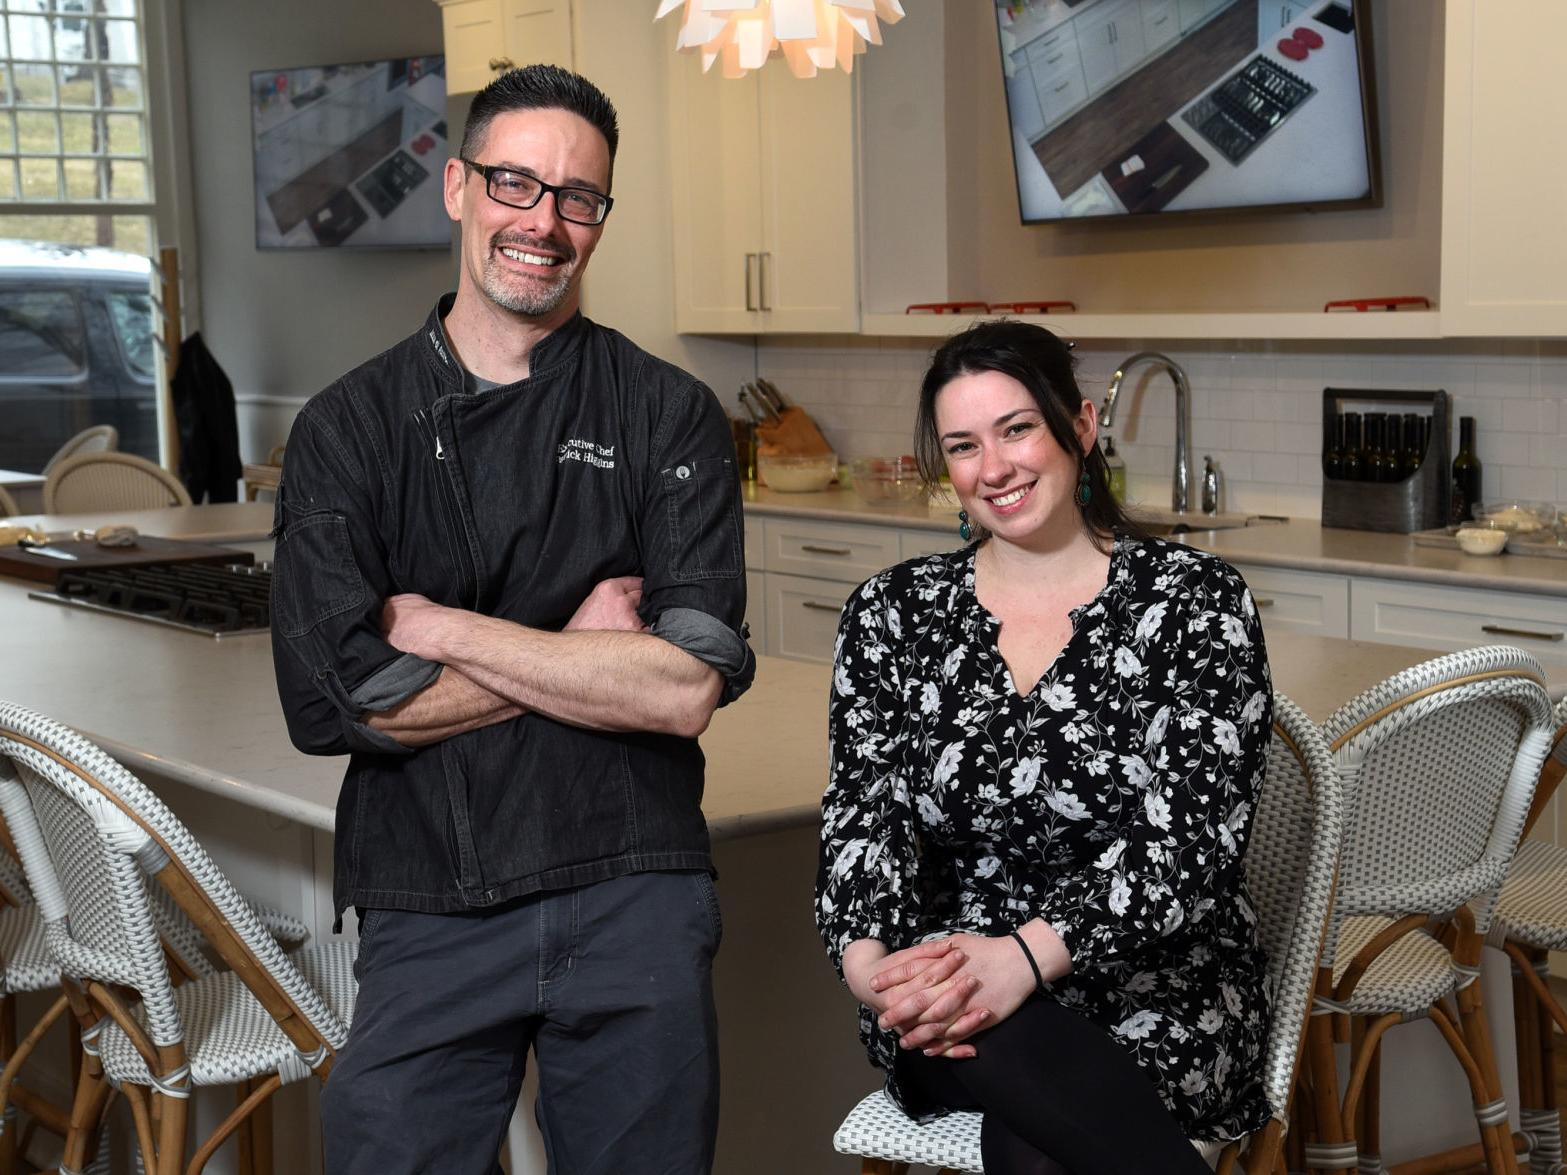 Educational Eating Inns Of Aurora Opens Demonstration Kitchen Relaunches Restaurant Lifestyles Auburnpub Com